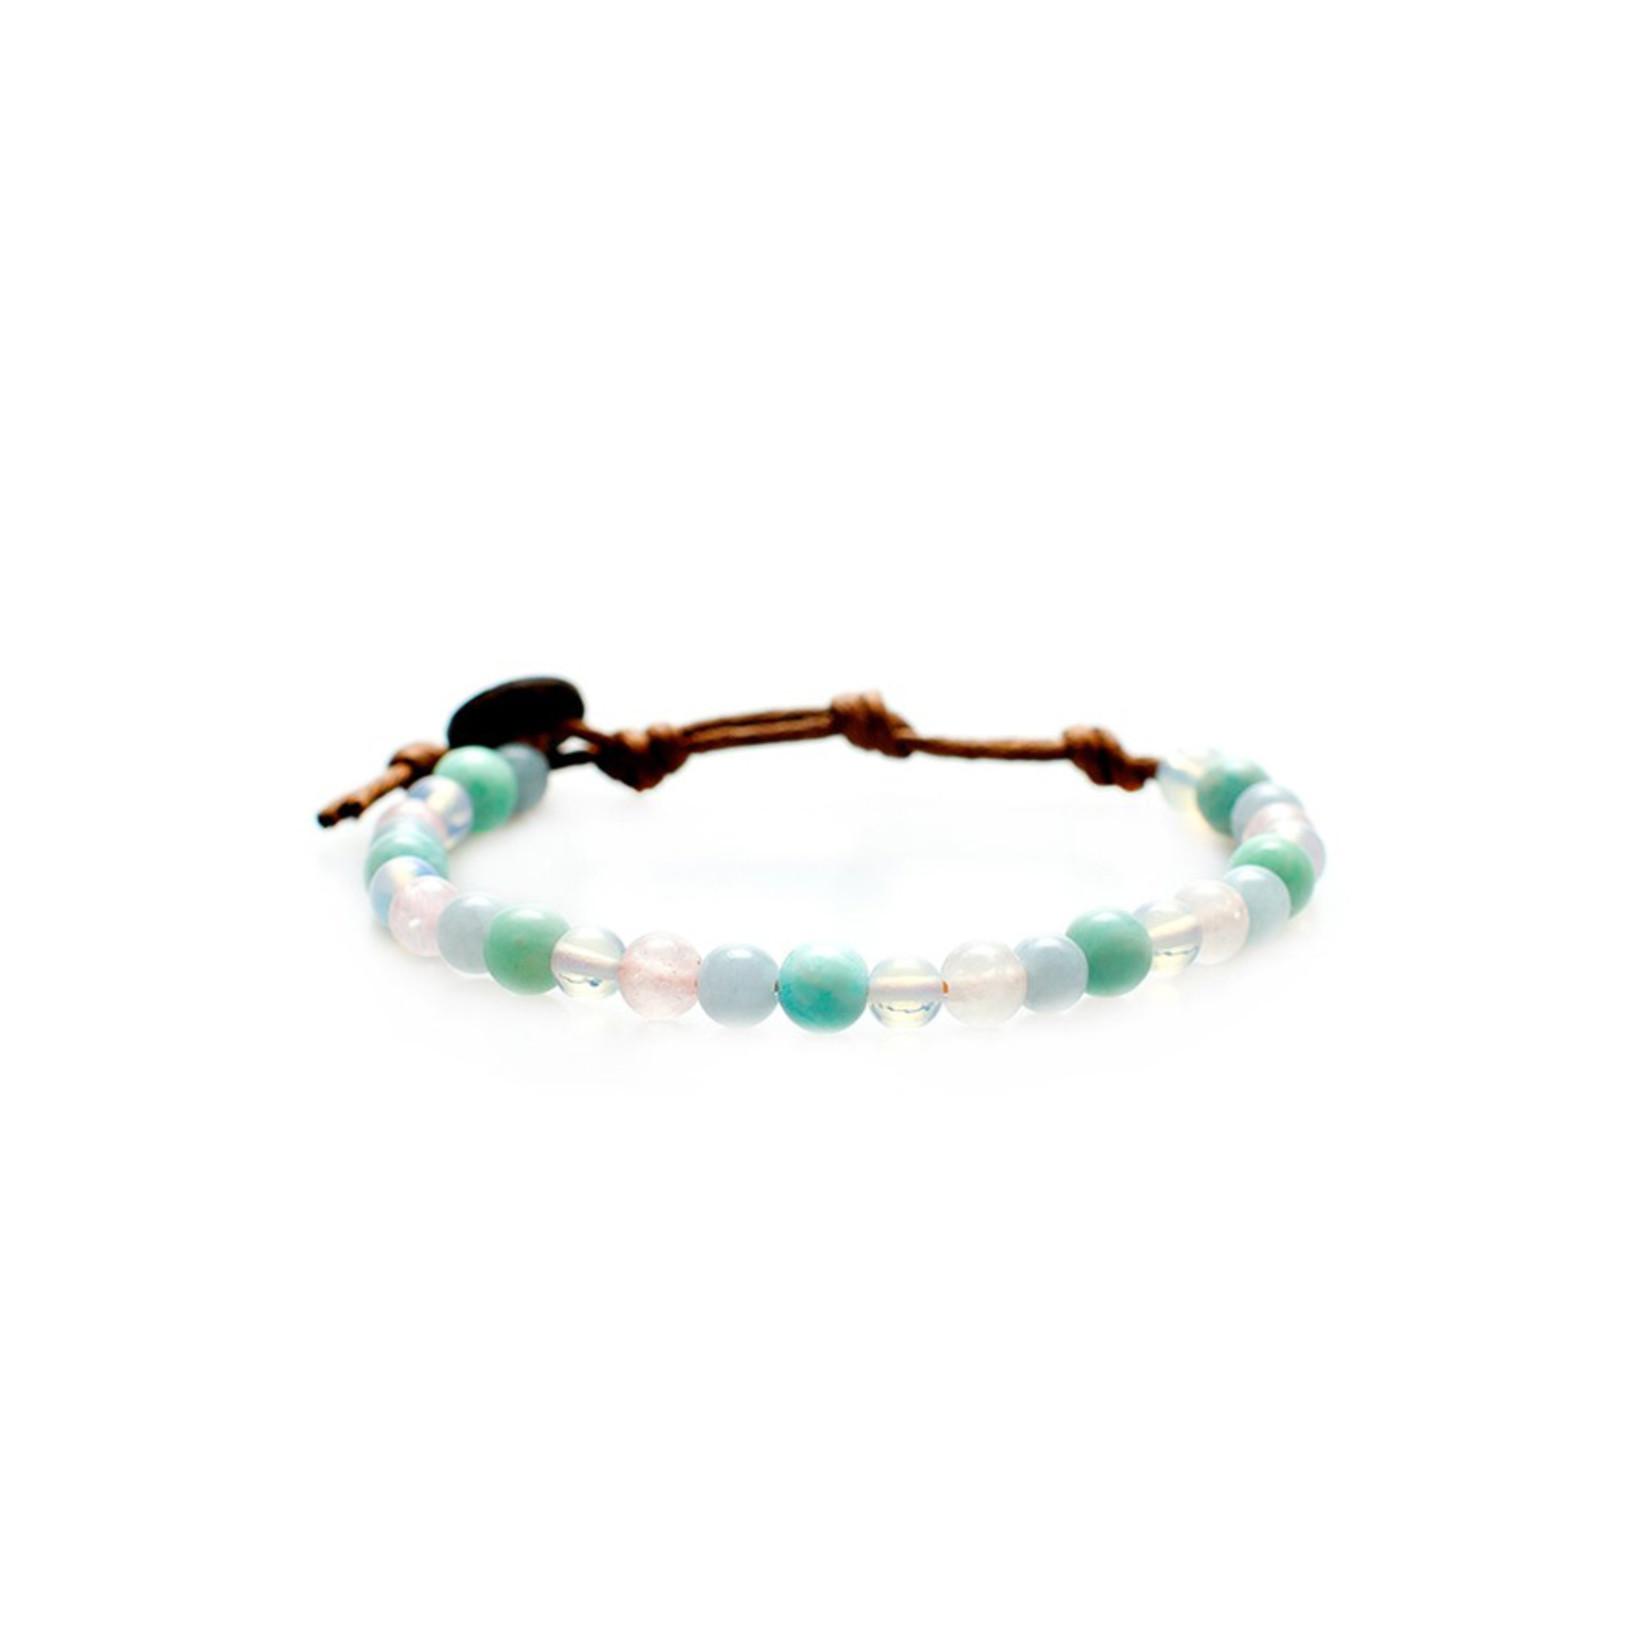 Lotus and Luna 6mm Healing Bracelet